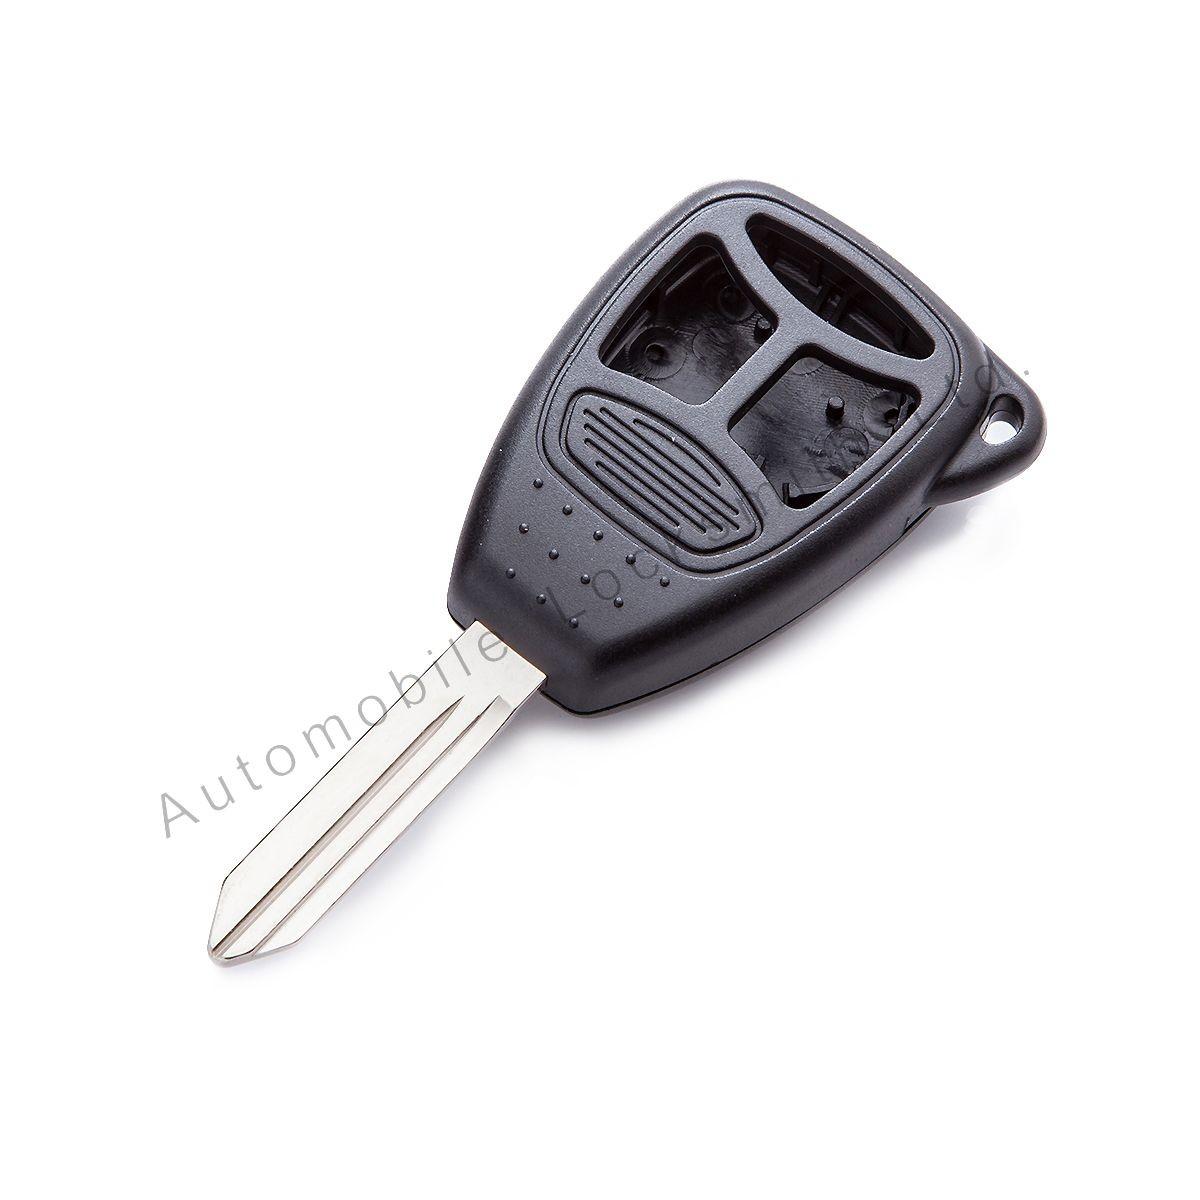 for Chrysler Jeep Dodge 3 button remote key case & blade